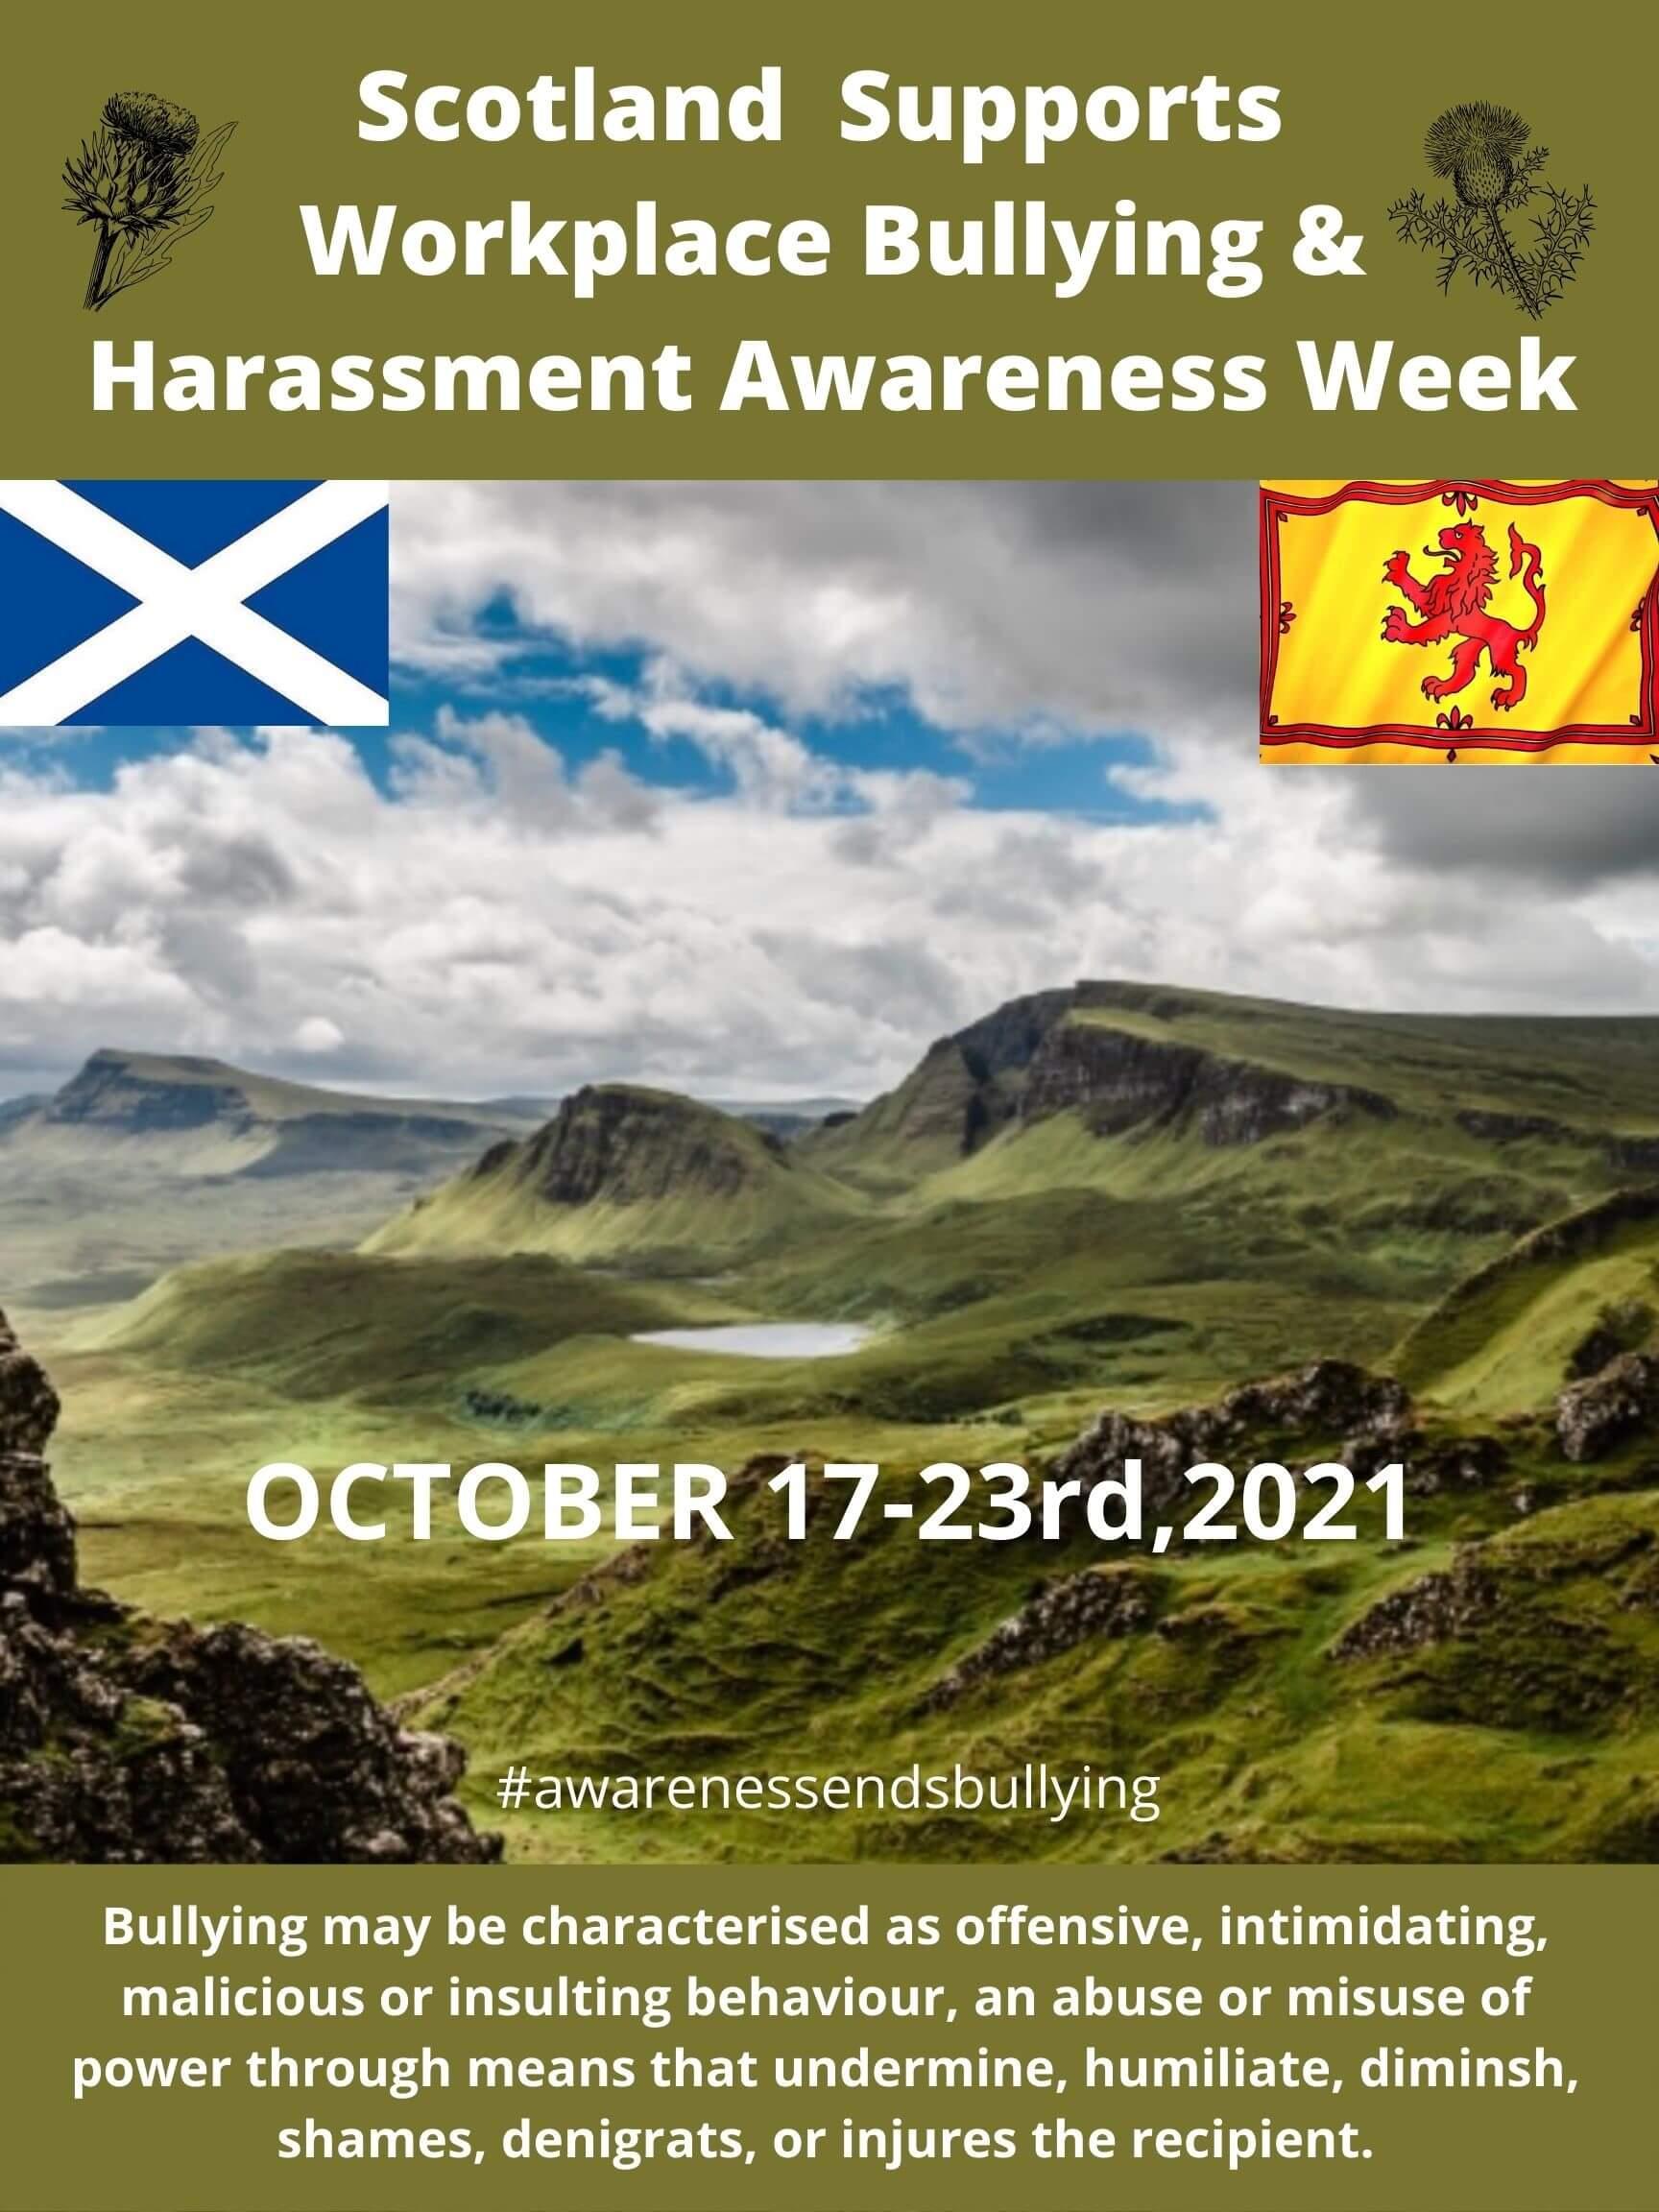 Workplace Bullying Awareness Week 2021, Scotland